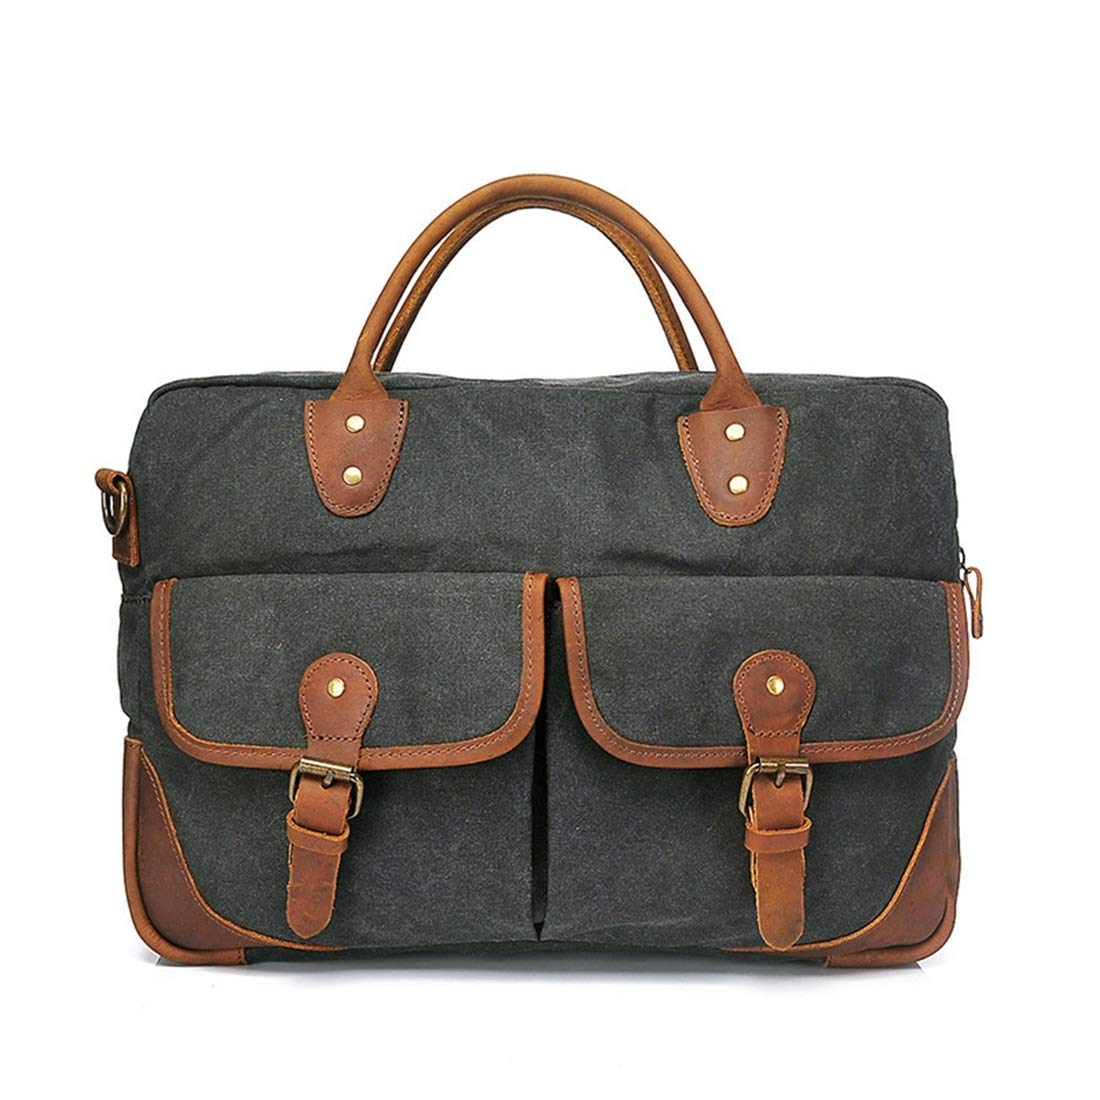 Carriemeow Simple Retro Zipper Briefcase Computer Bag Canvas Messenger Bag Shoulder Bag Color:Blue Color : Gray